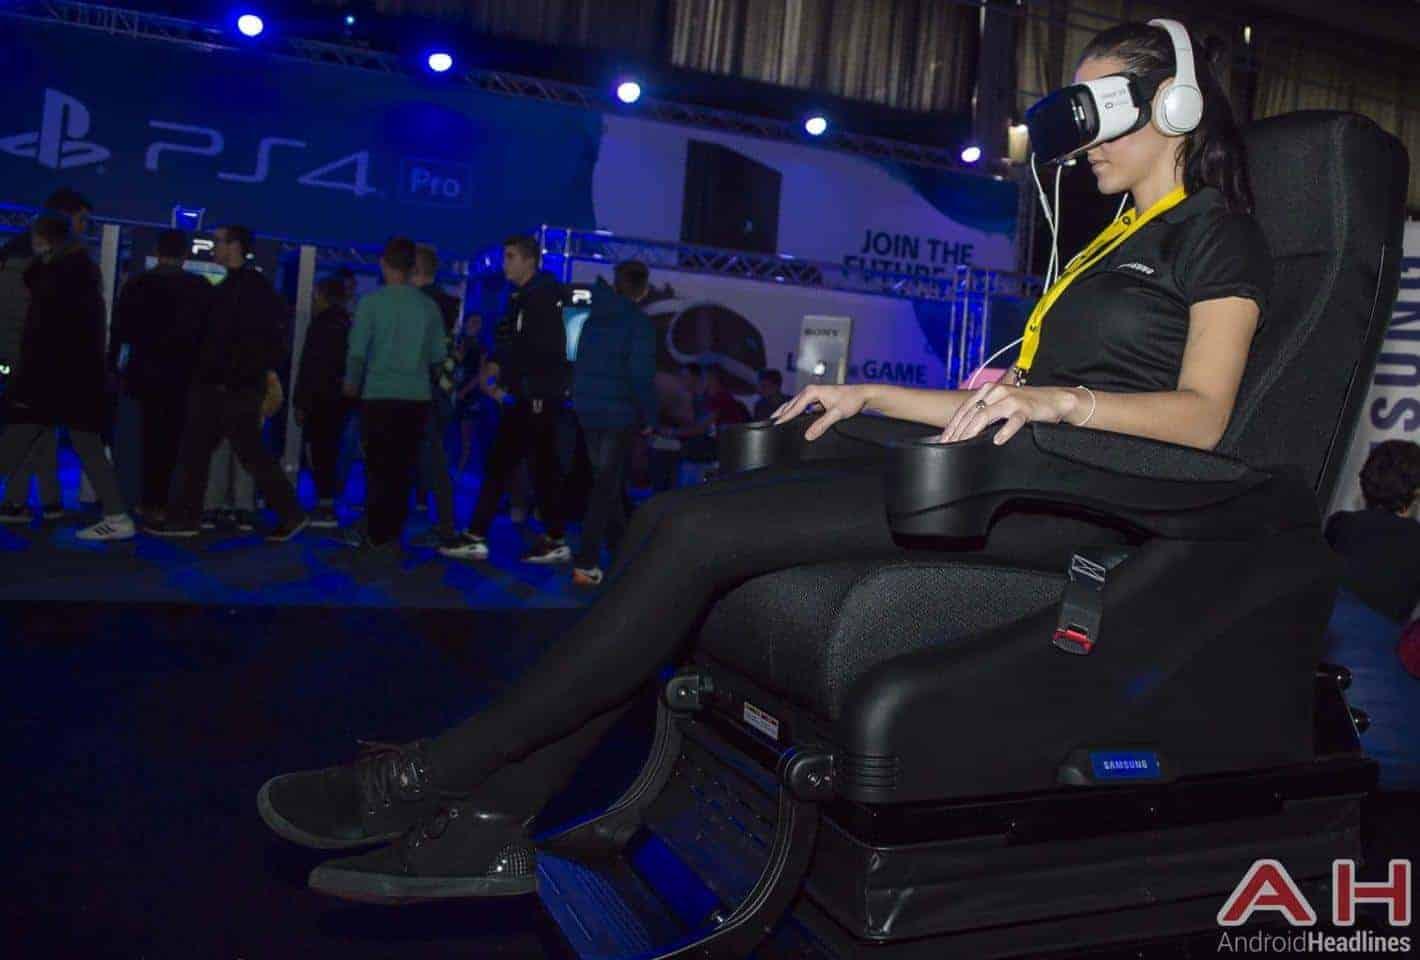 Samsung Gear VR Headset Sitting Session AH